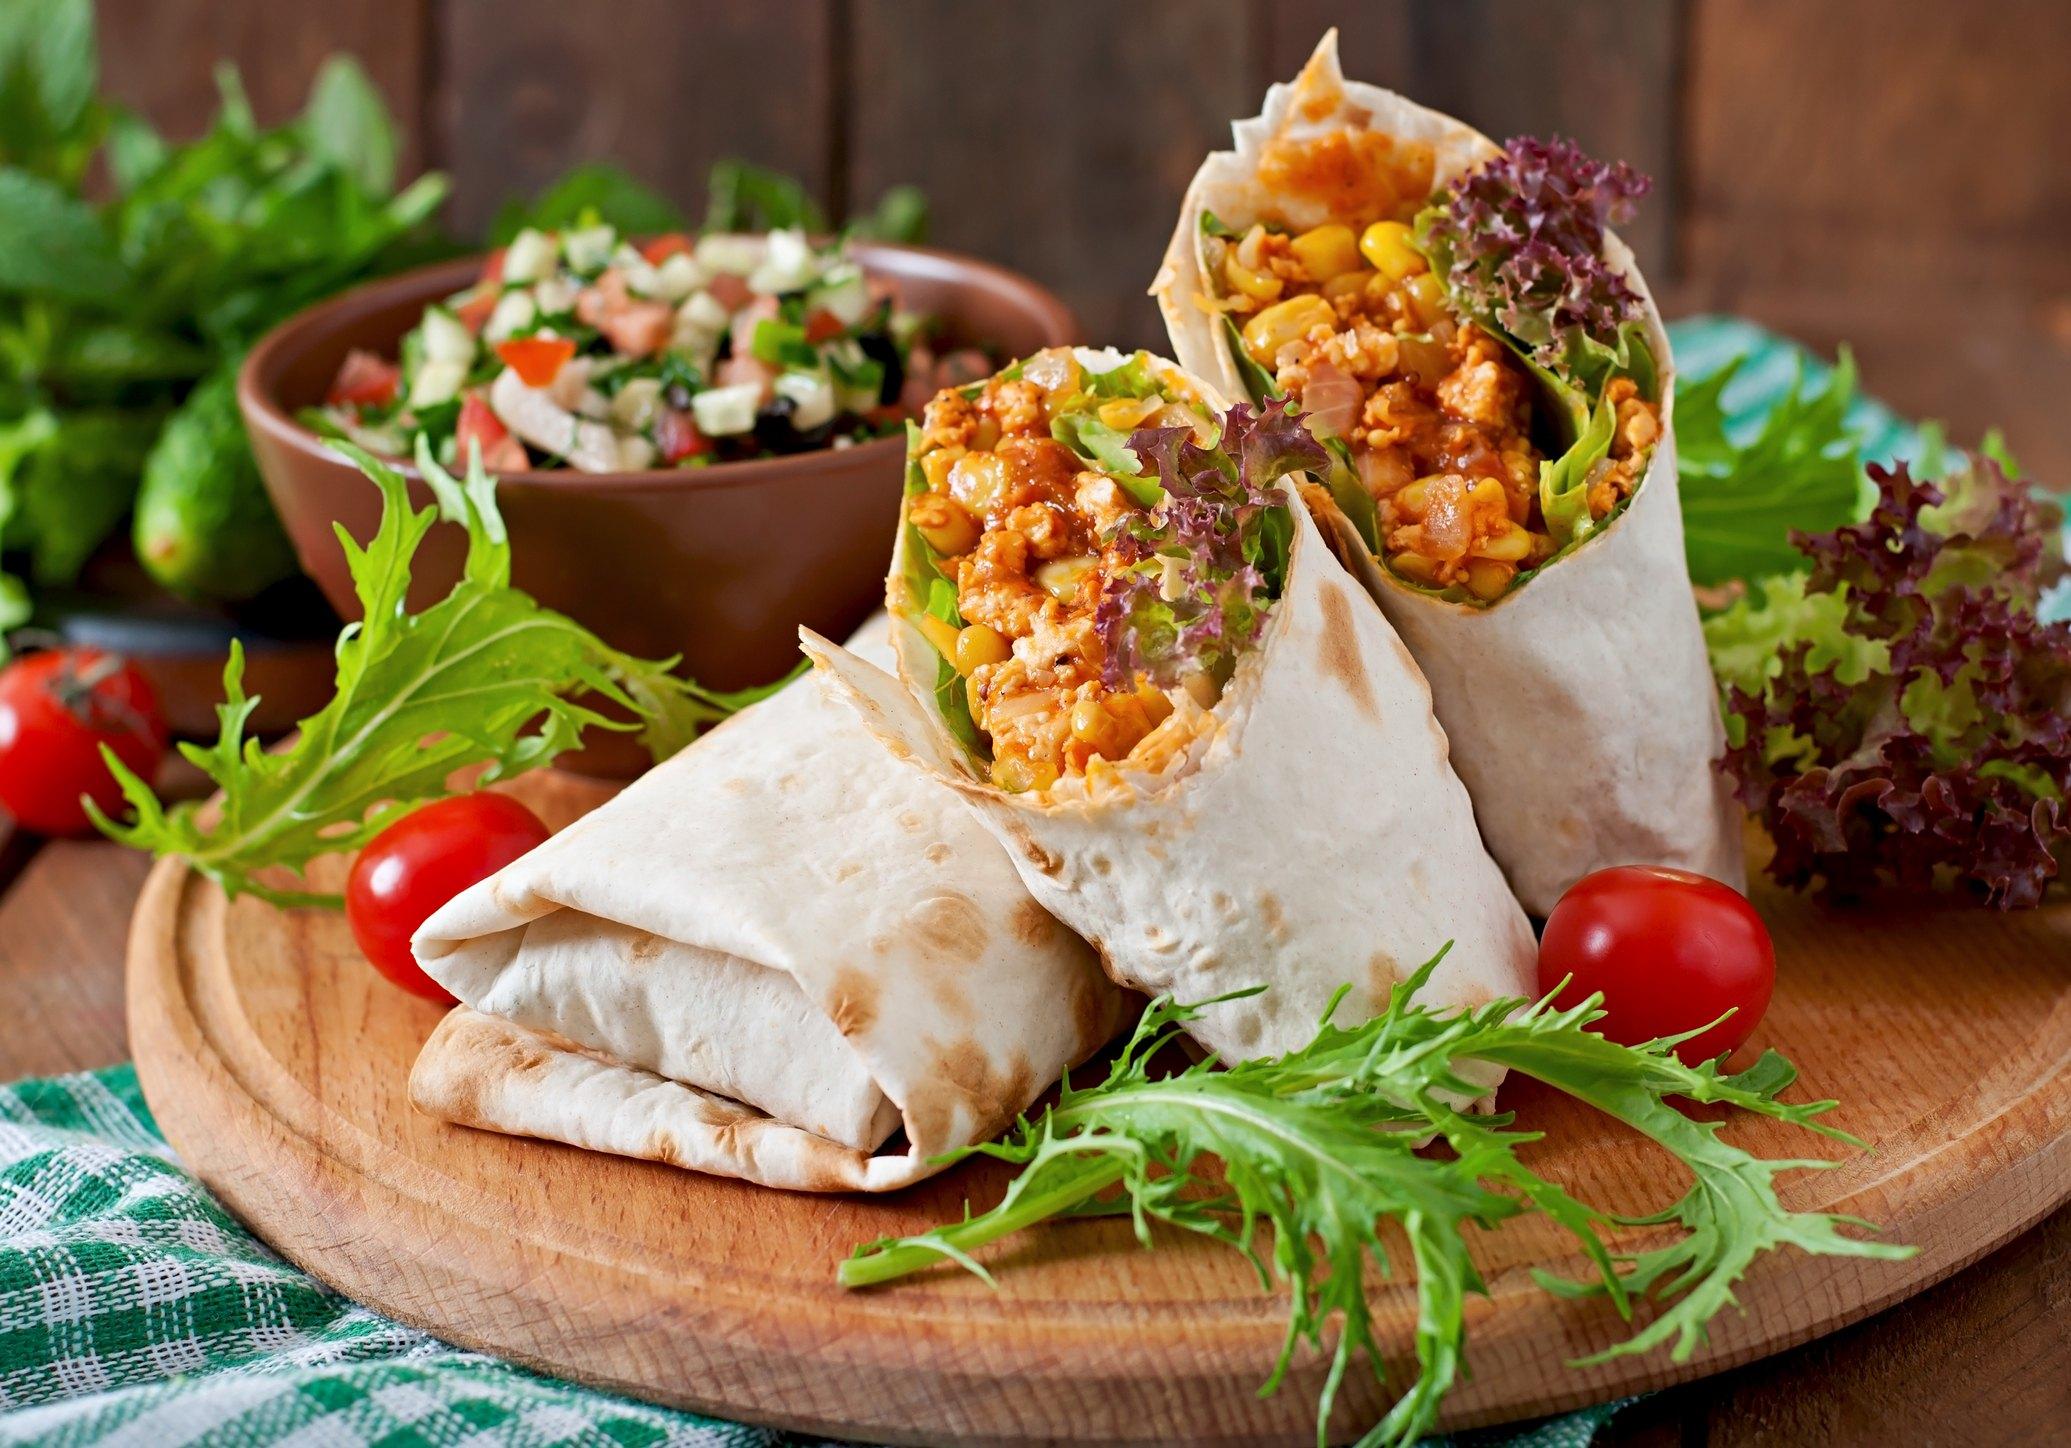 Burritos wraps